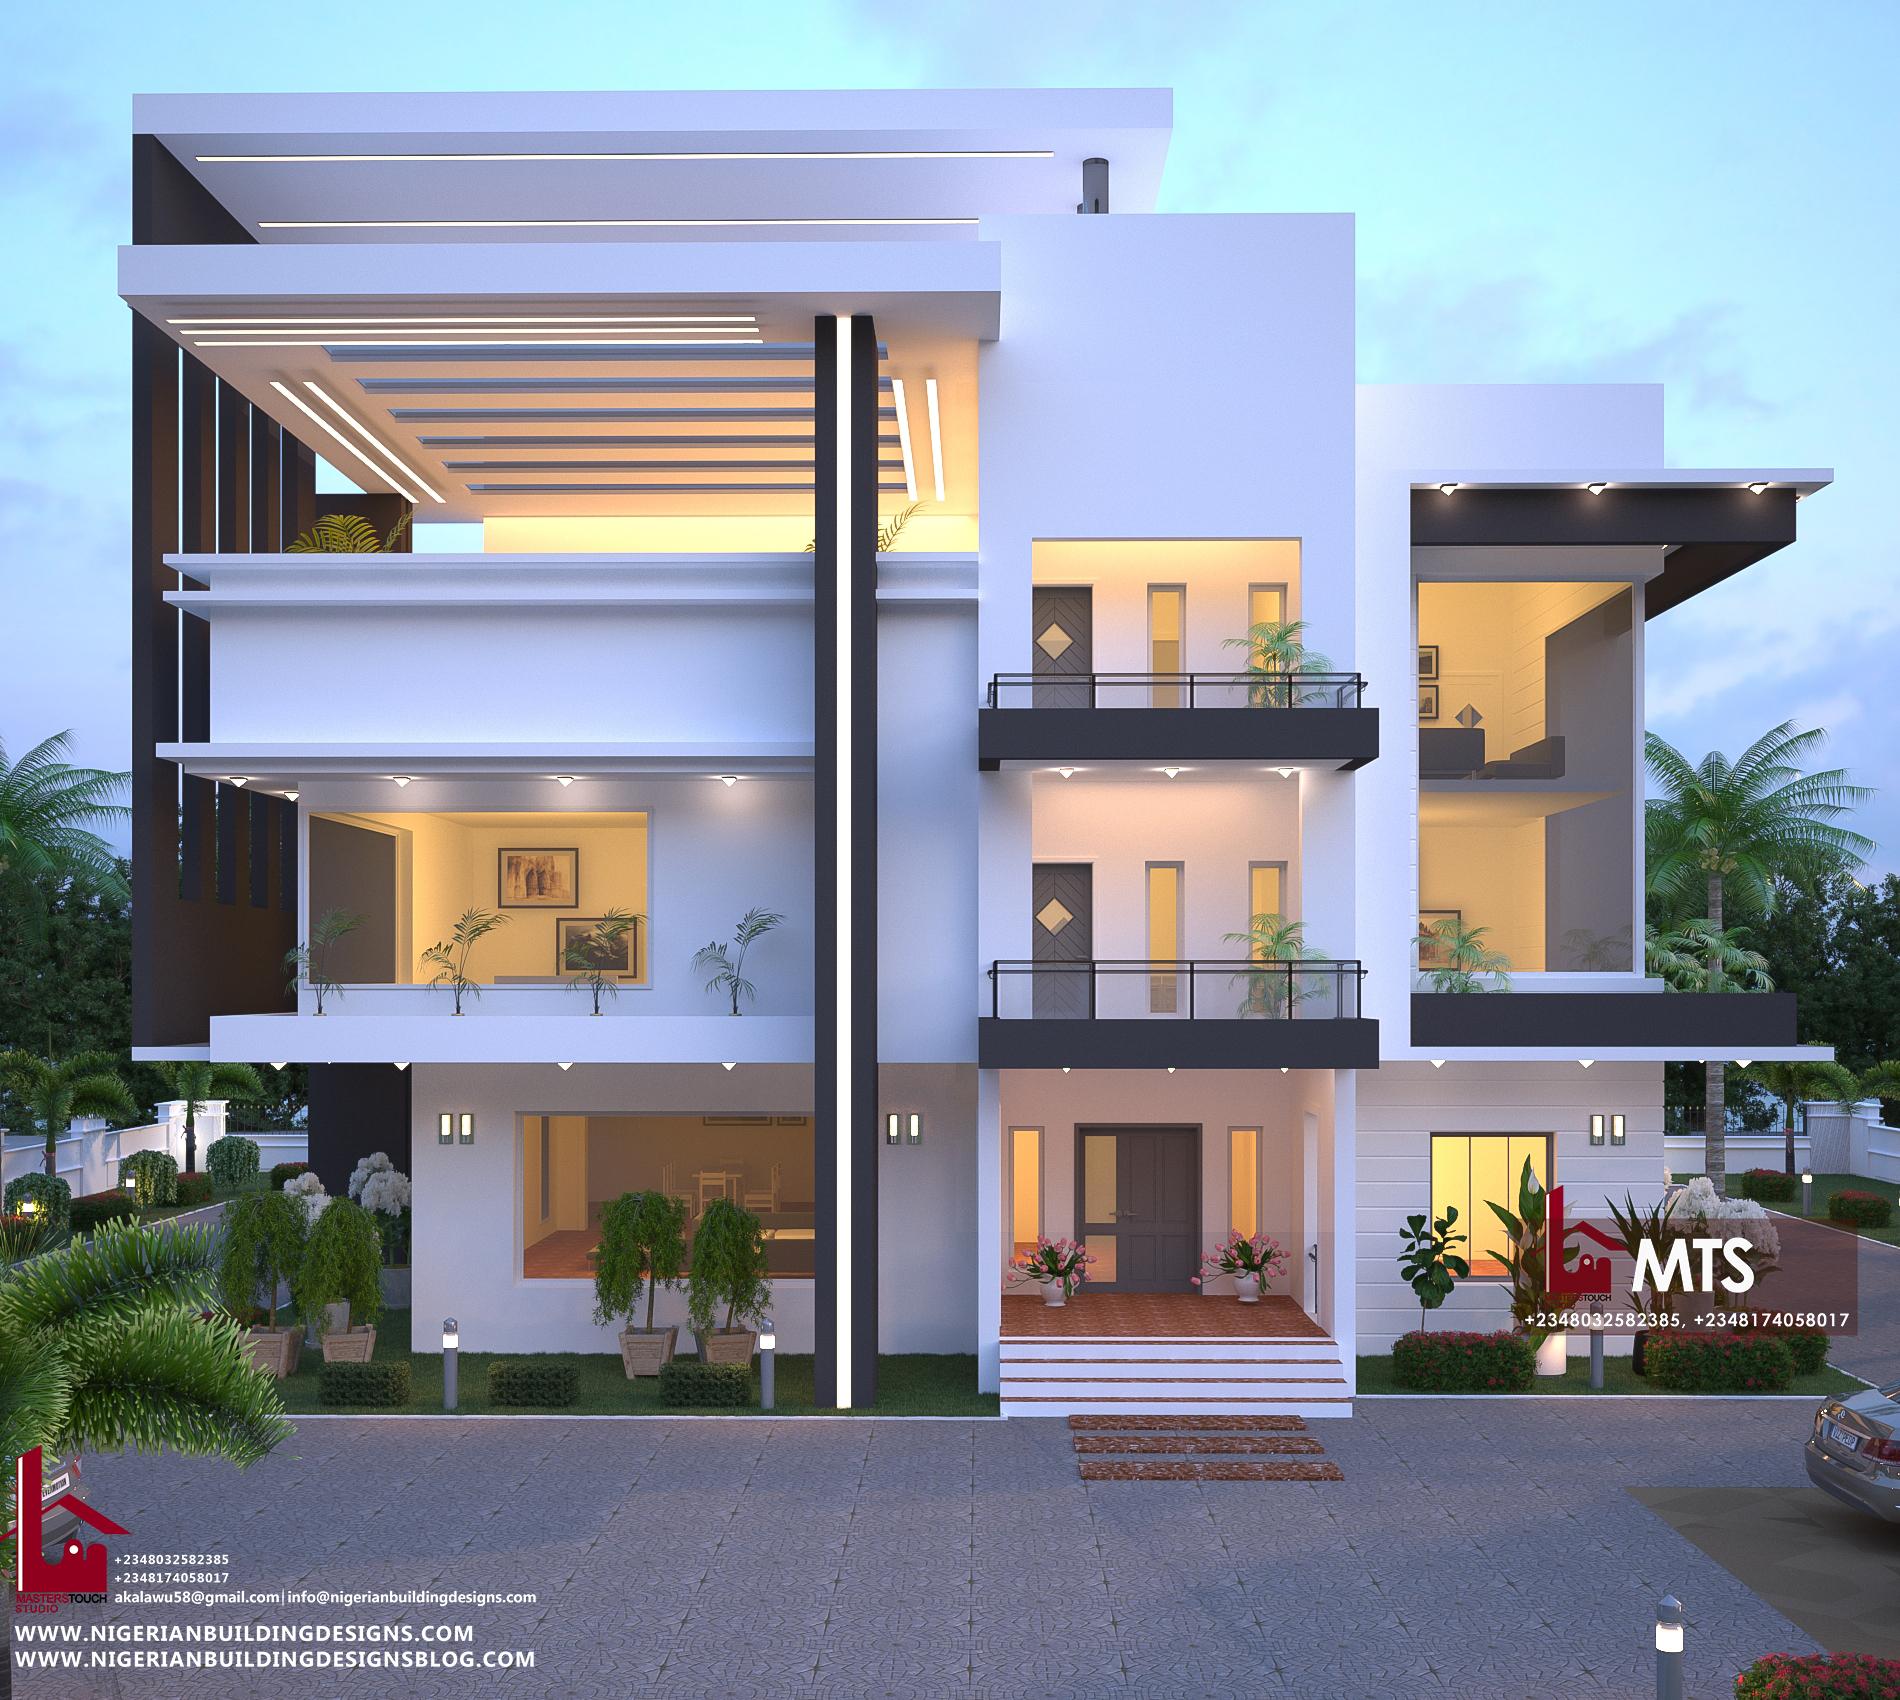 7 Bedroom Duplex Rf D7003 Nigerian Building Designs